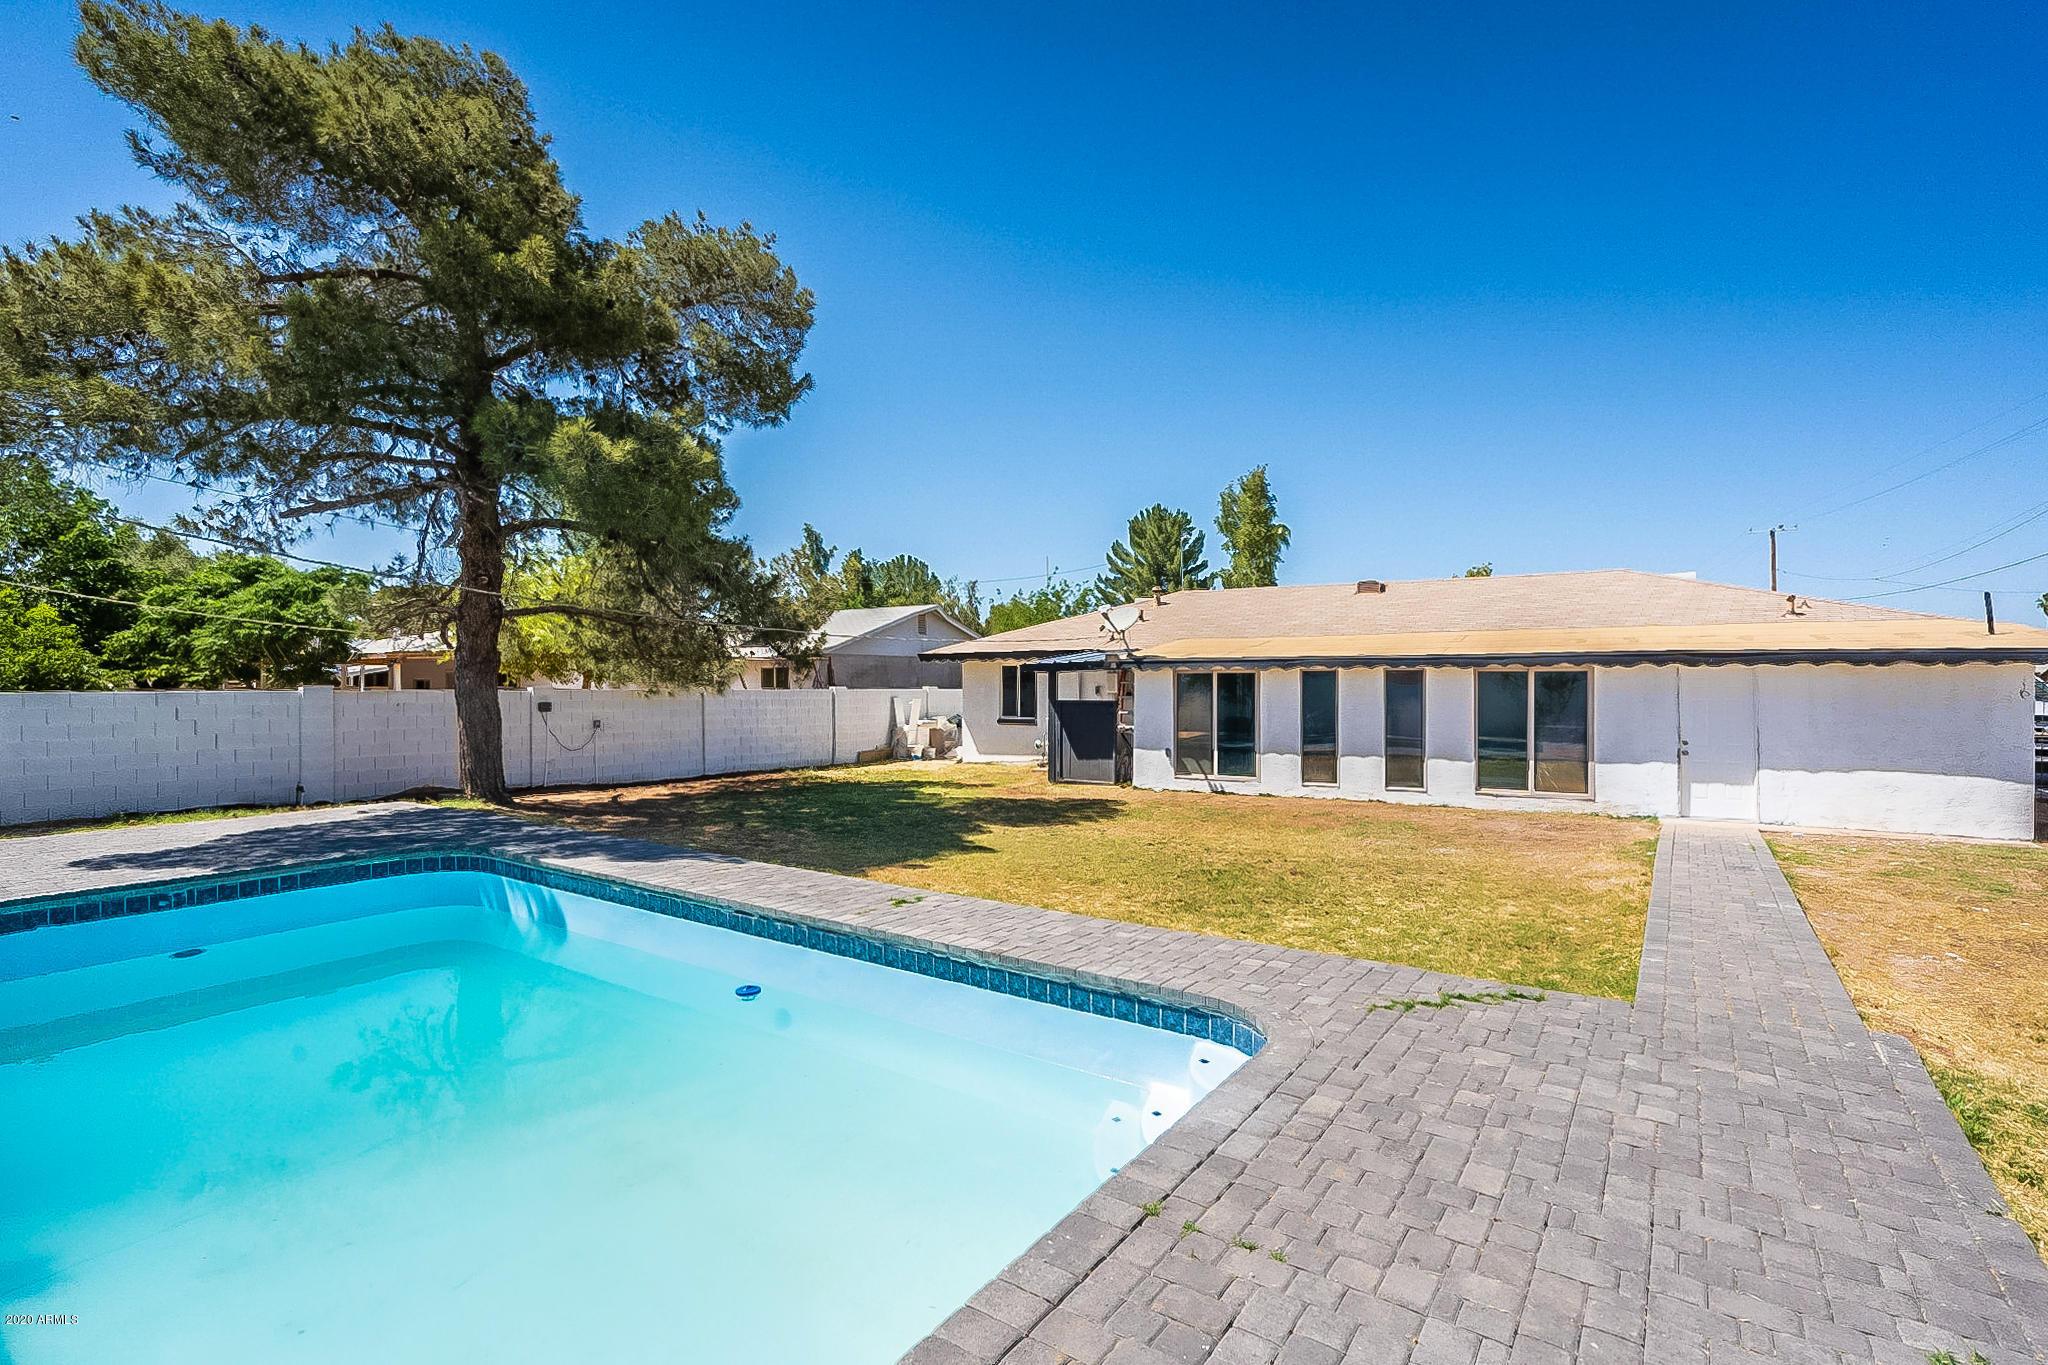 MLS 6072096 601 W MONTEREY Street, Chandler, AZ 85225 Chandler AZ Private Pool